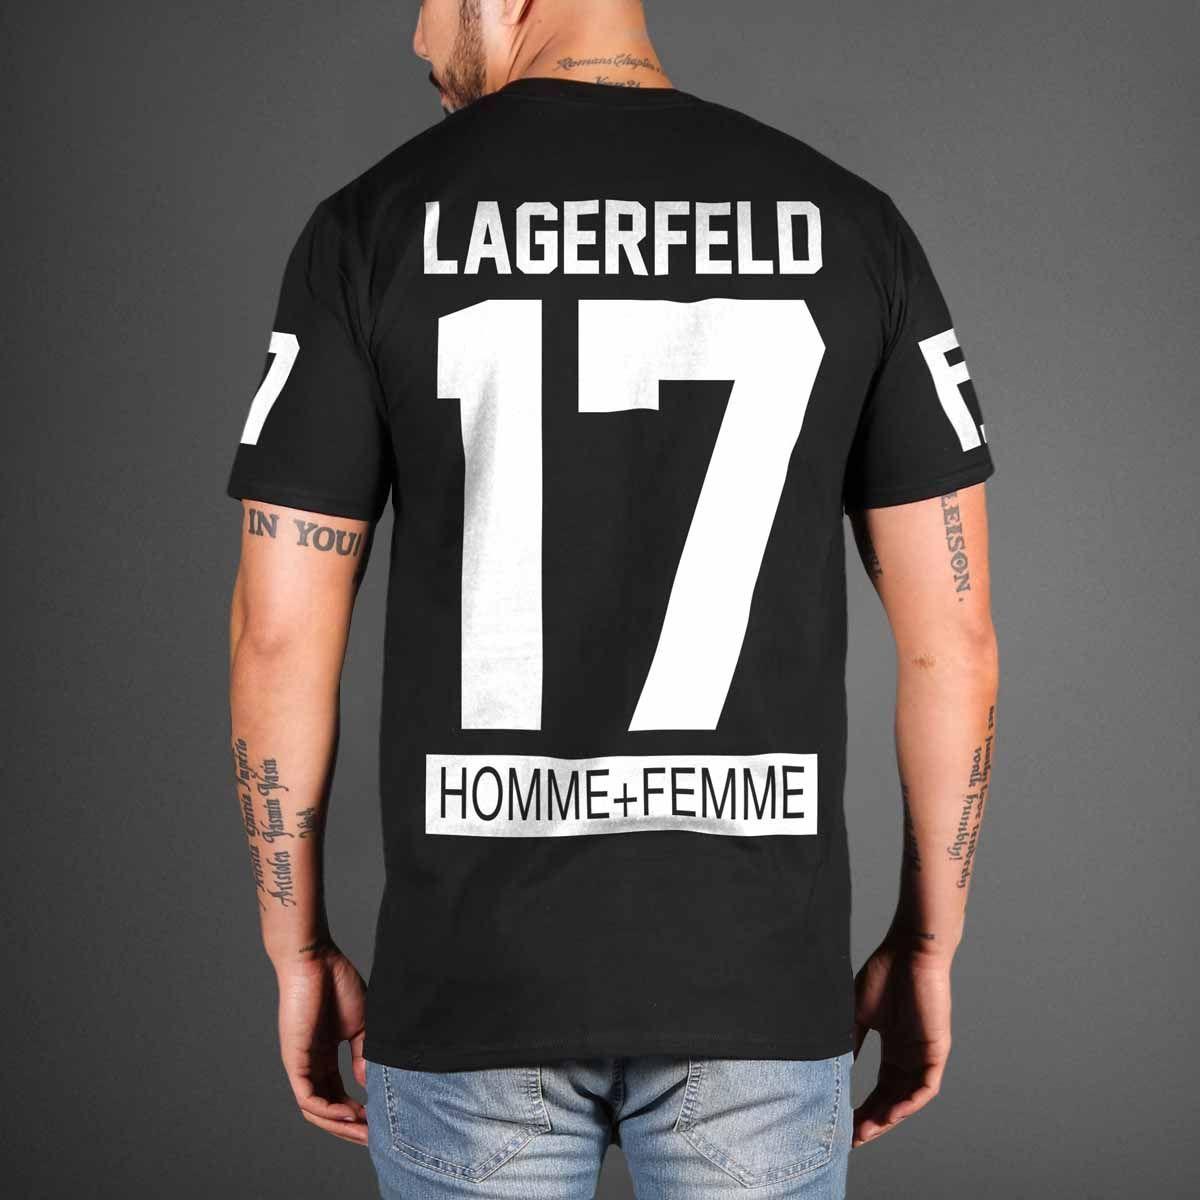 ecb31656bc16 HOMME FEMME LA Karl Lagerfeld x Fendi Hockey T-Shirt   swag   Swag ...